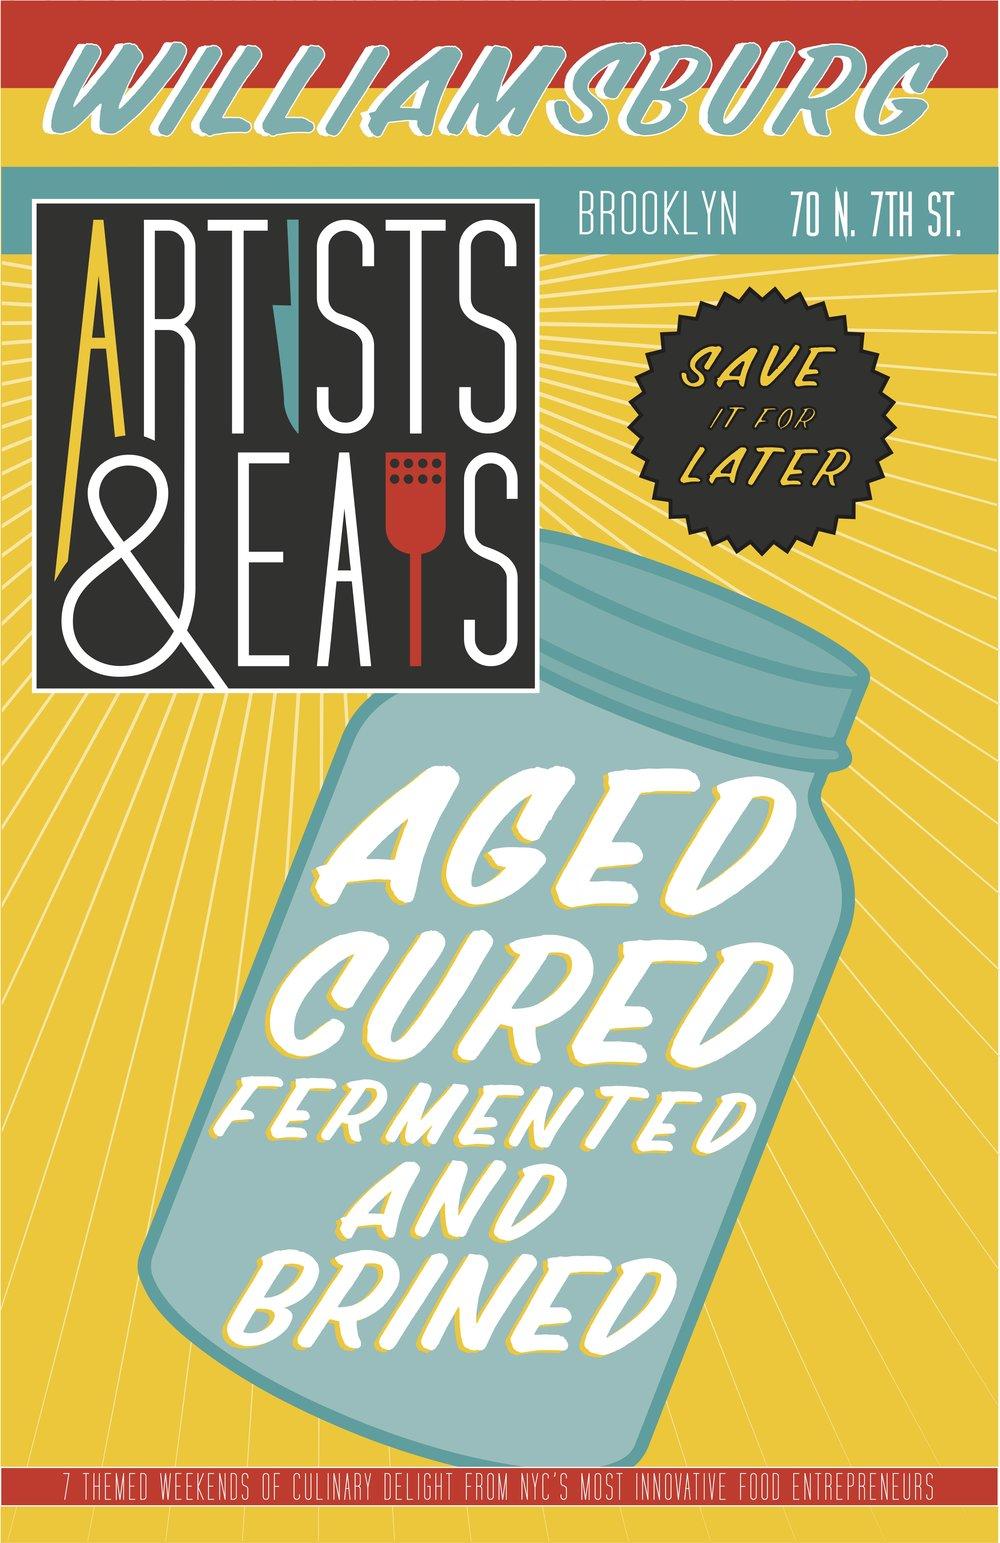 Artists & Eats